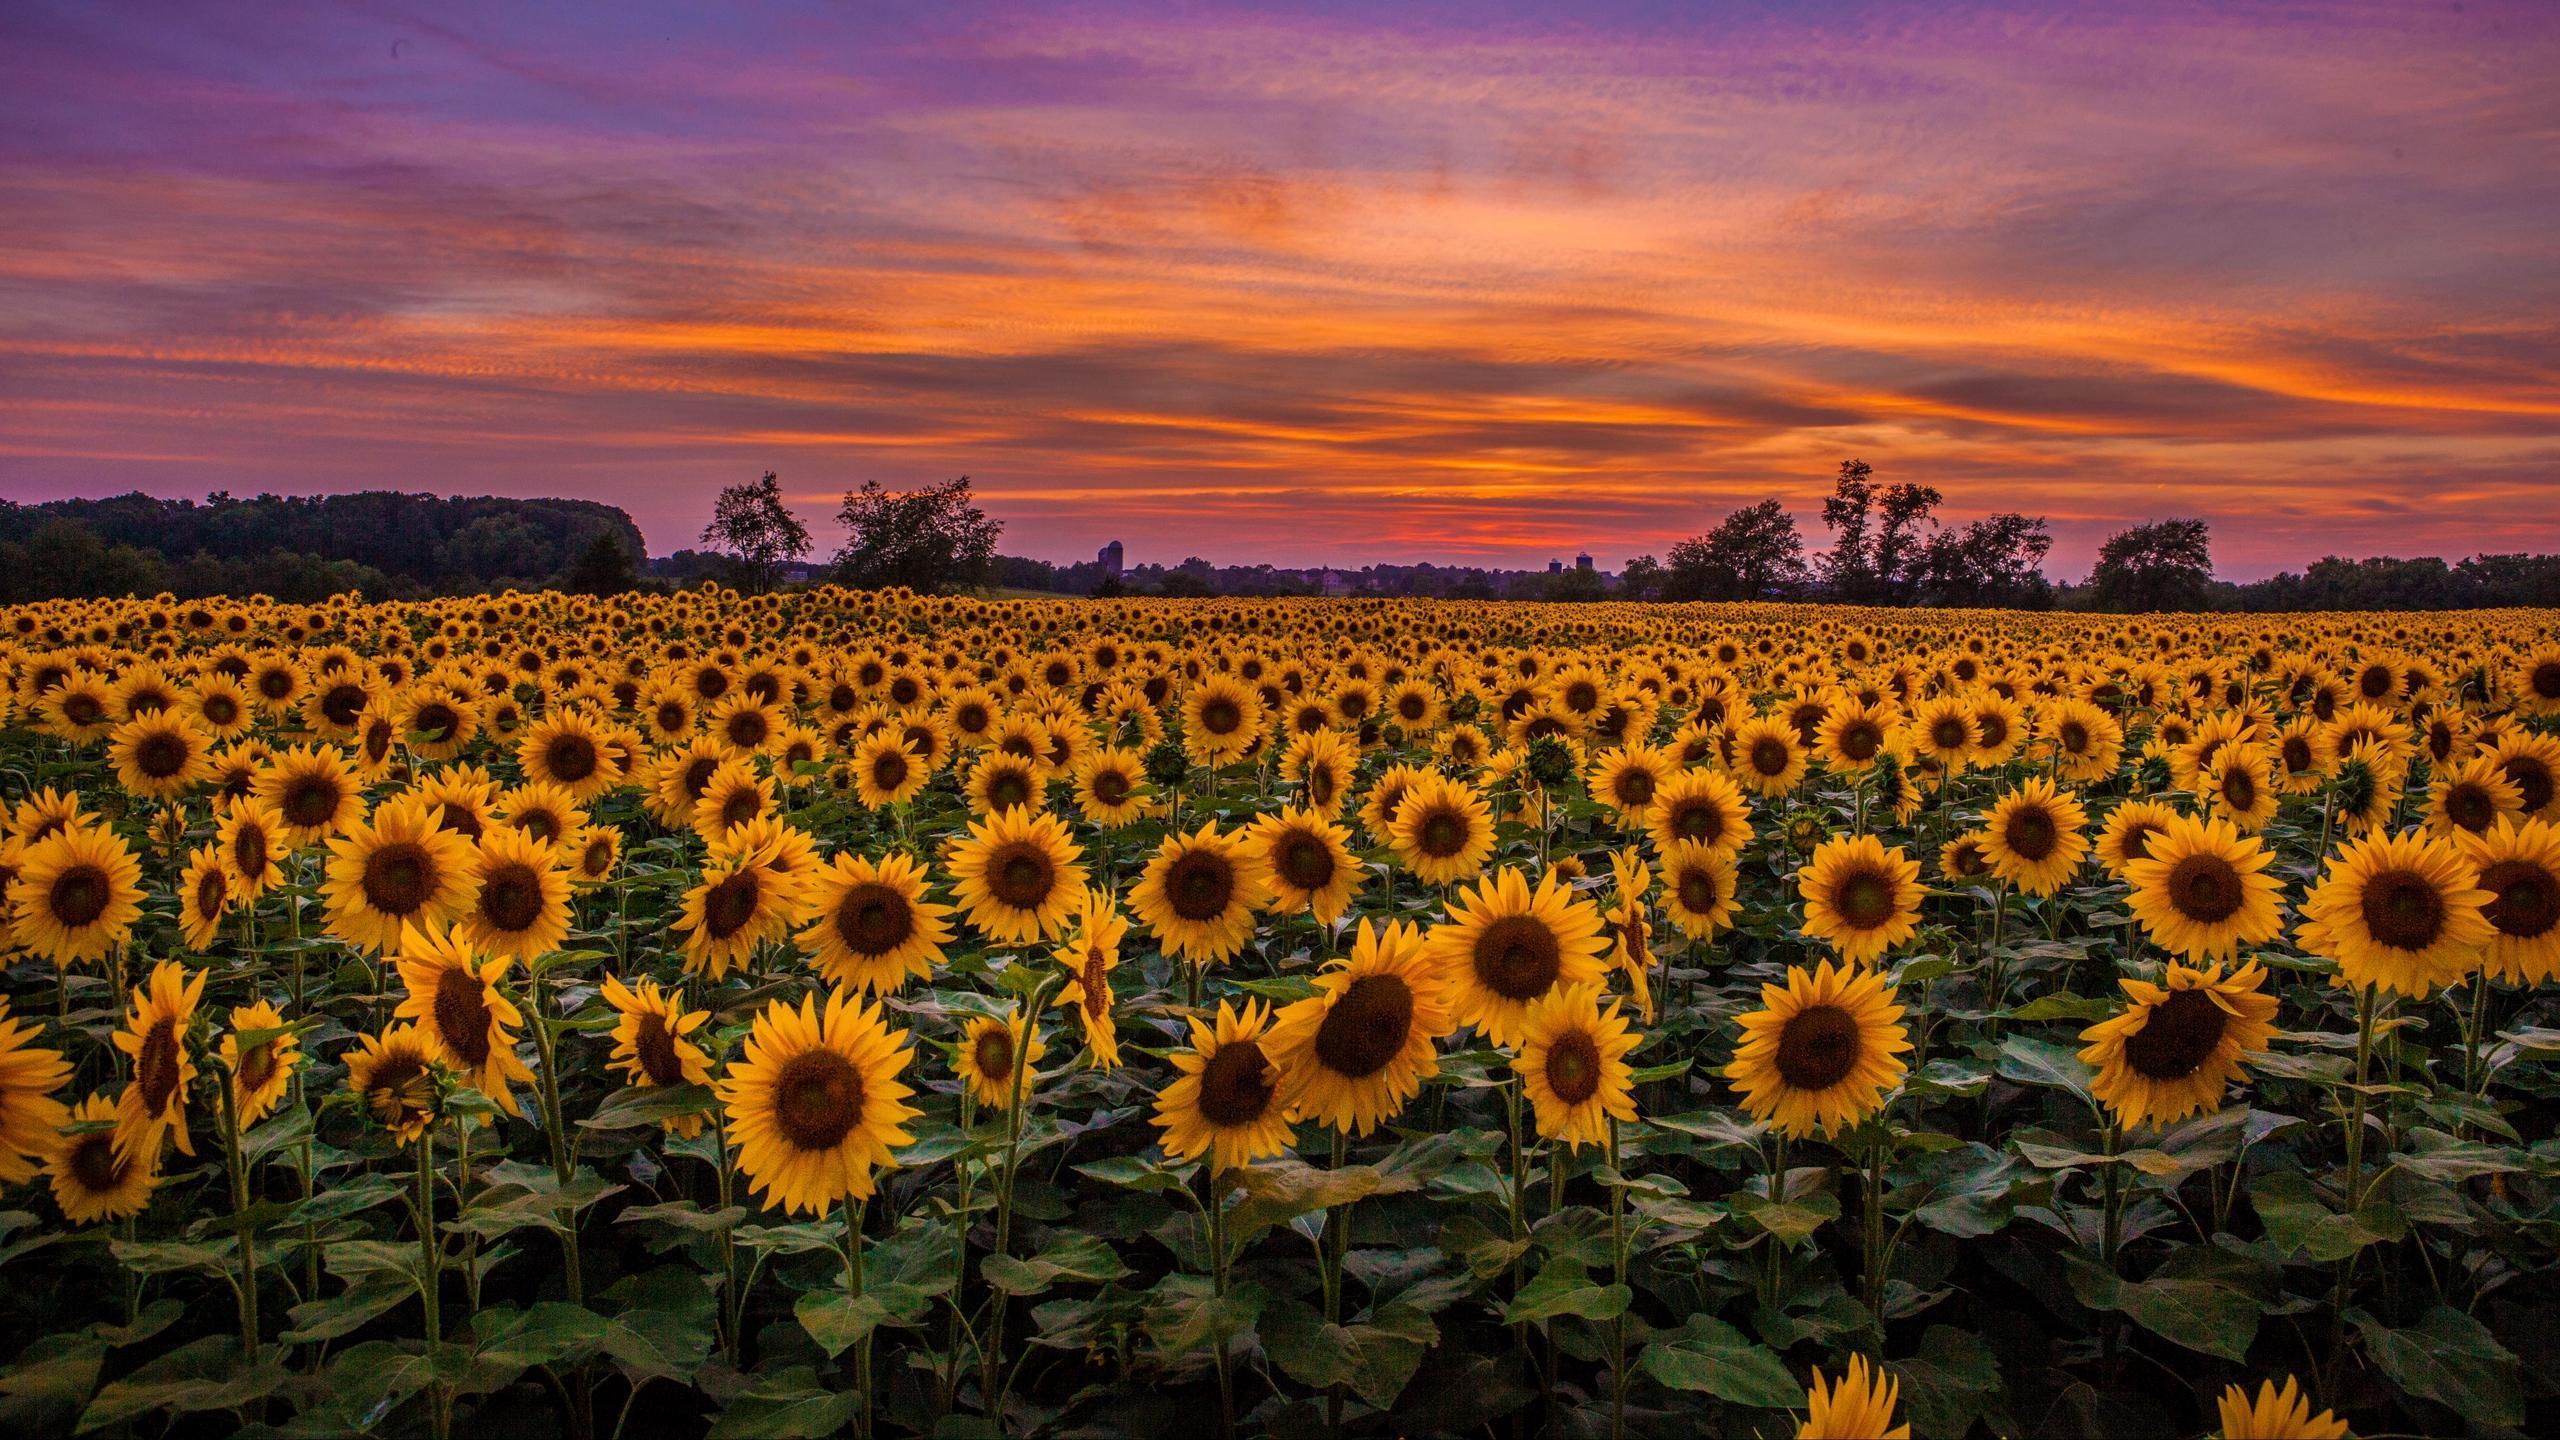 Sunflower Aesthetic Sunset Wallpapers Wallpaper Cave